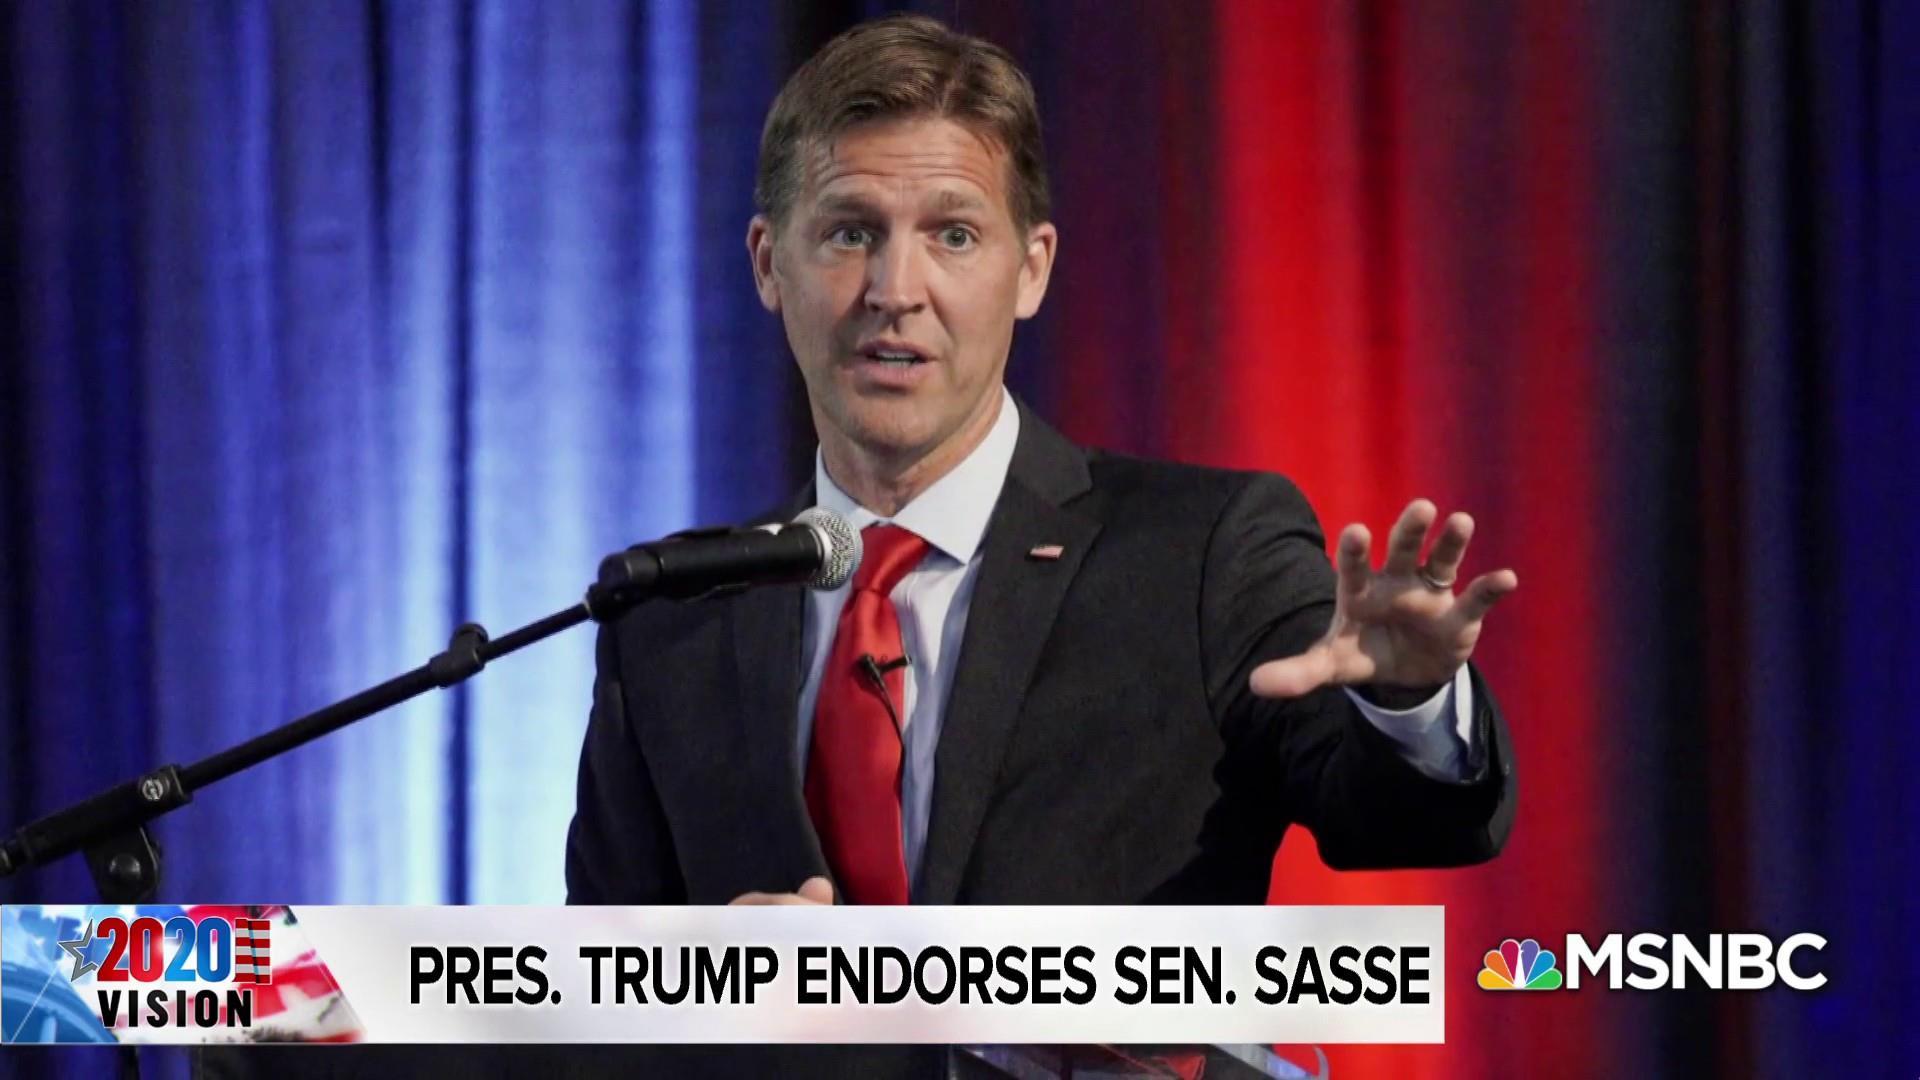 Trump-critic Sasse gets president's endorsement